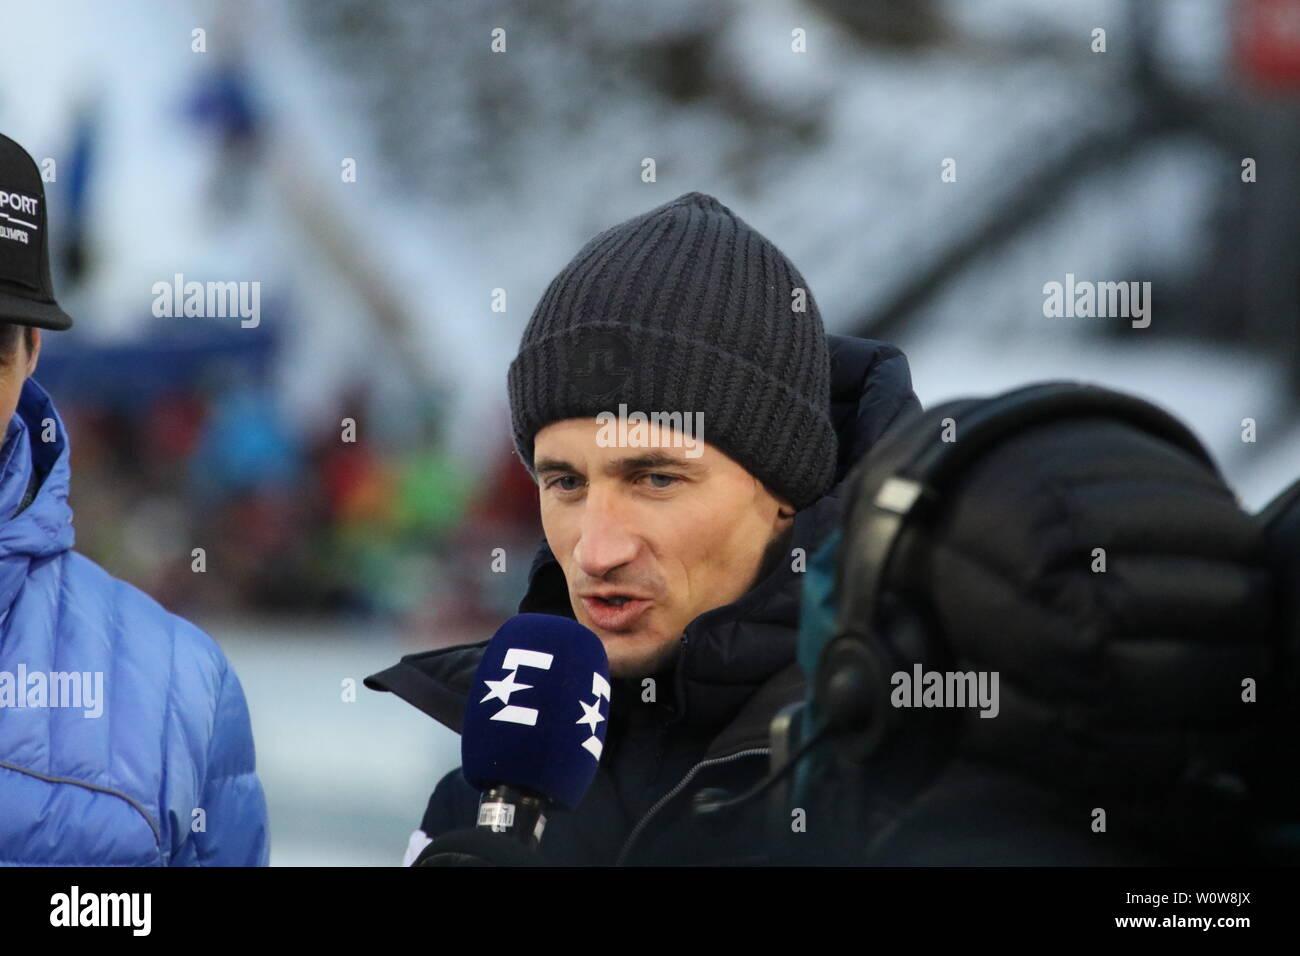 Martin Schmitt (TV-Experte /Skisprung-Experte, Eurosport, Ex-Weltmeister) beim Auftaktspringen Vierschanzentournee 18-19 Oberstdorf Stock Photo